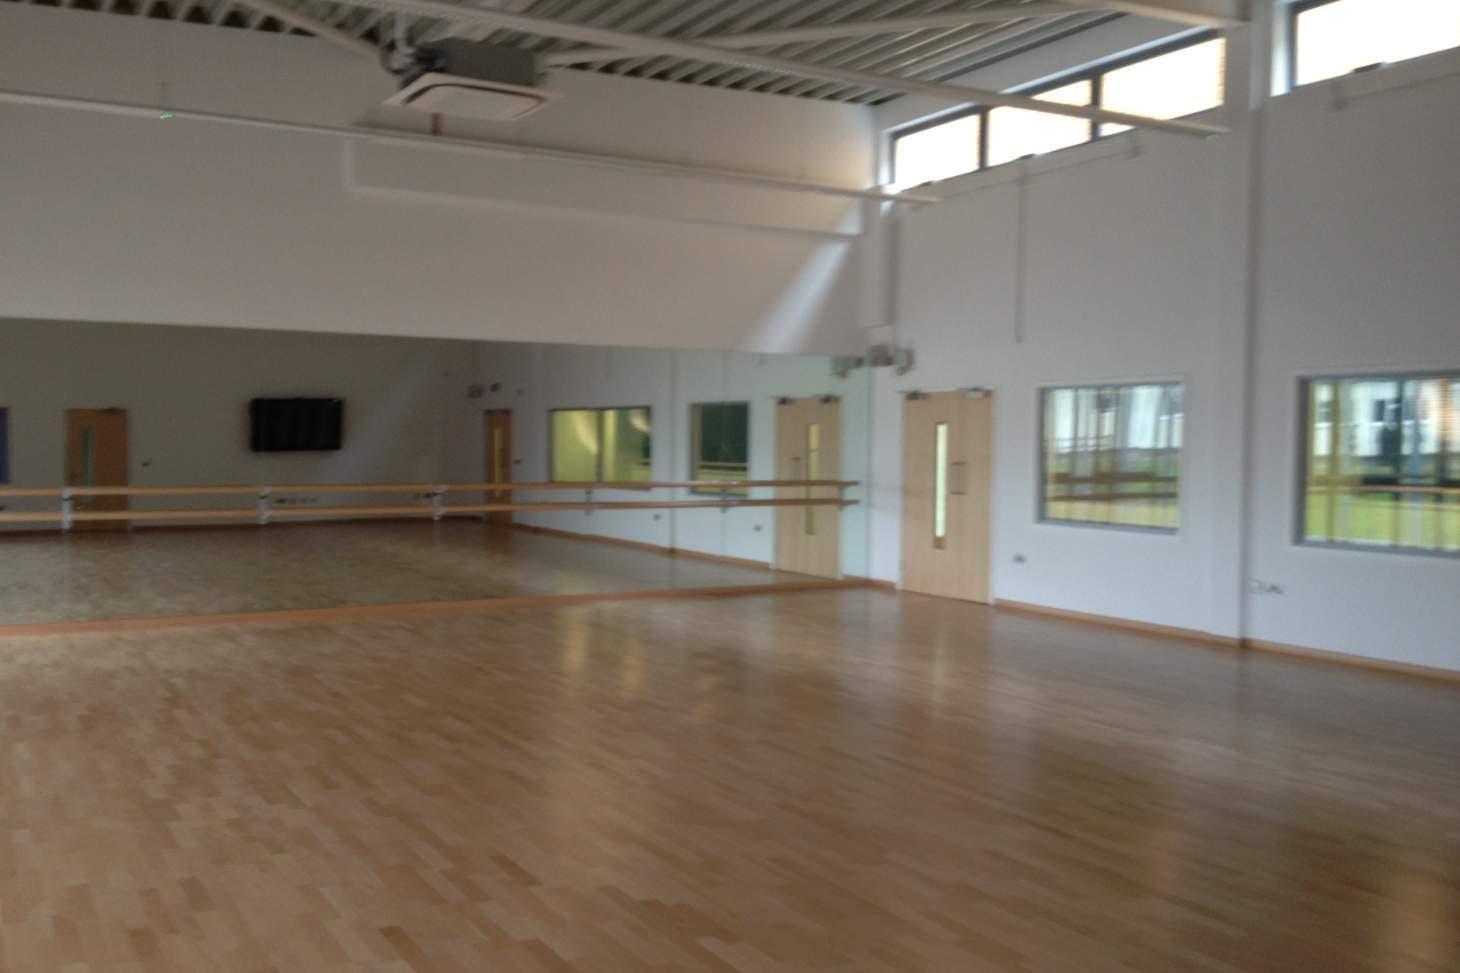 Wellsway Sports Centre Studio | Dance studio space hire